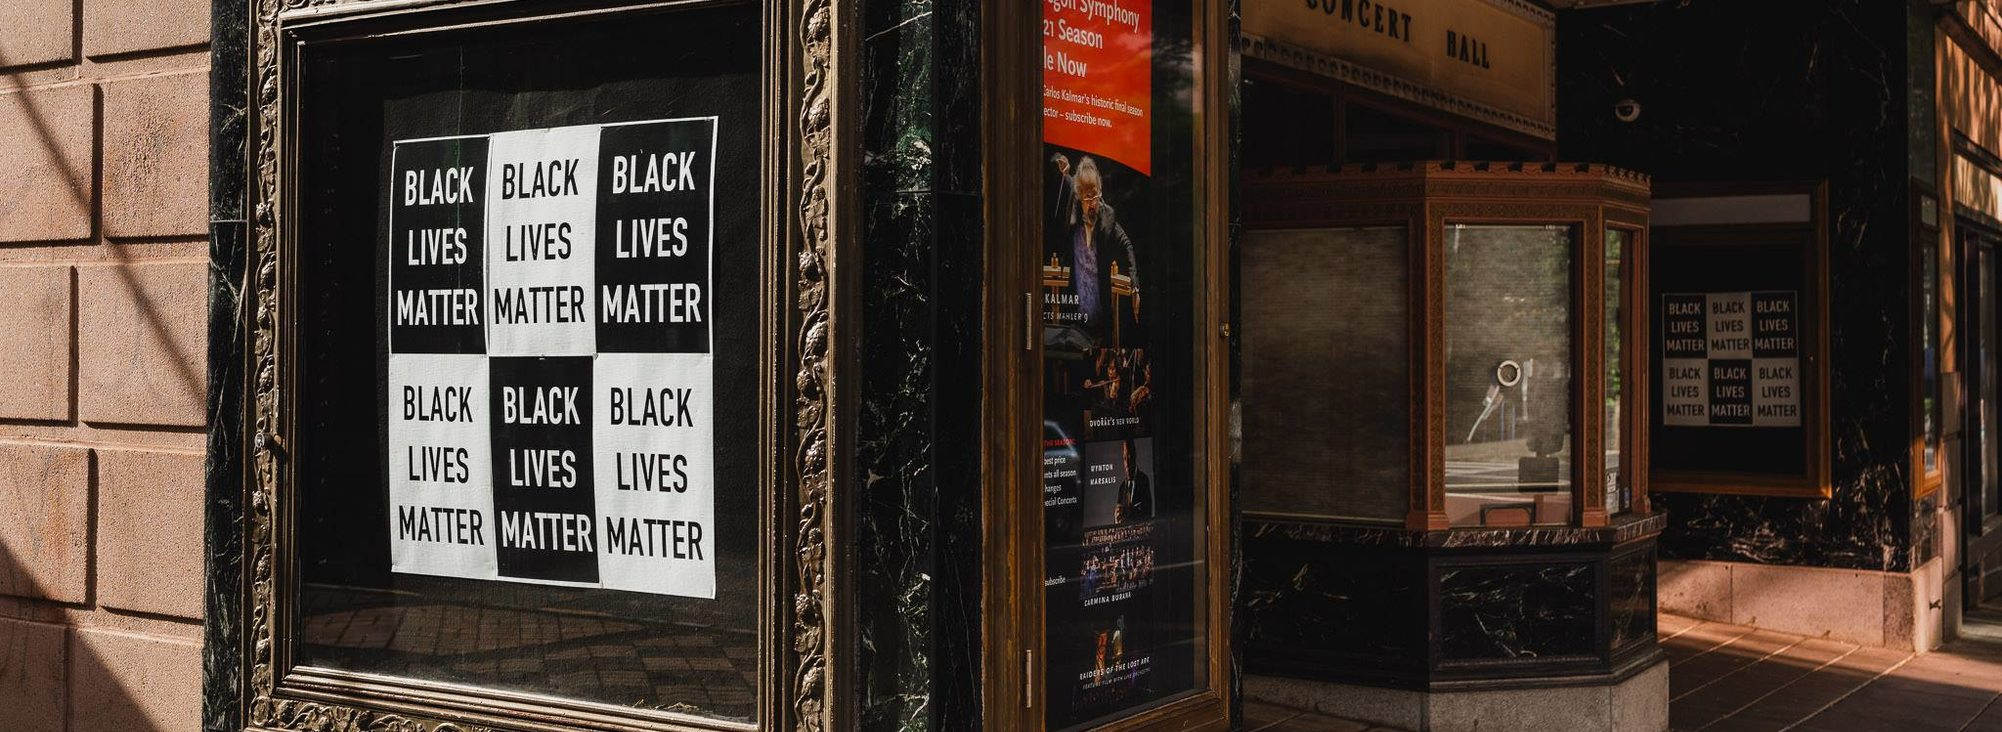 Black Lives Matter posters at the Arlene Schnitzer Concert Hall